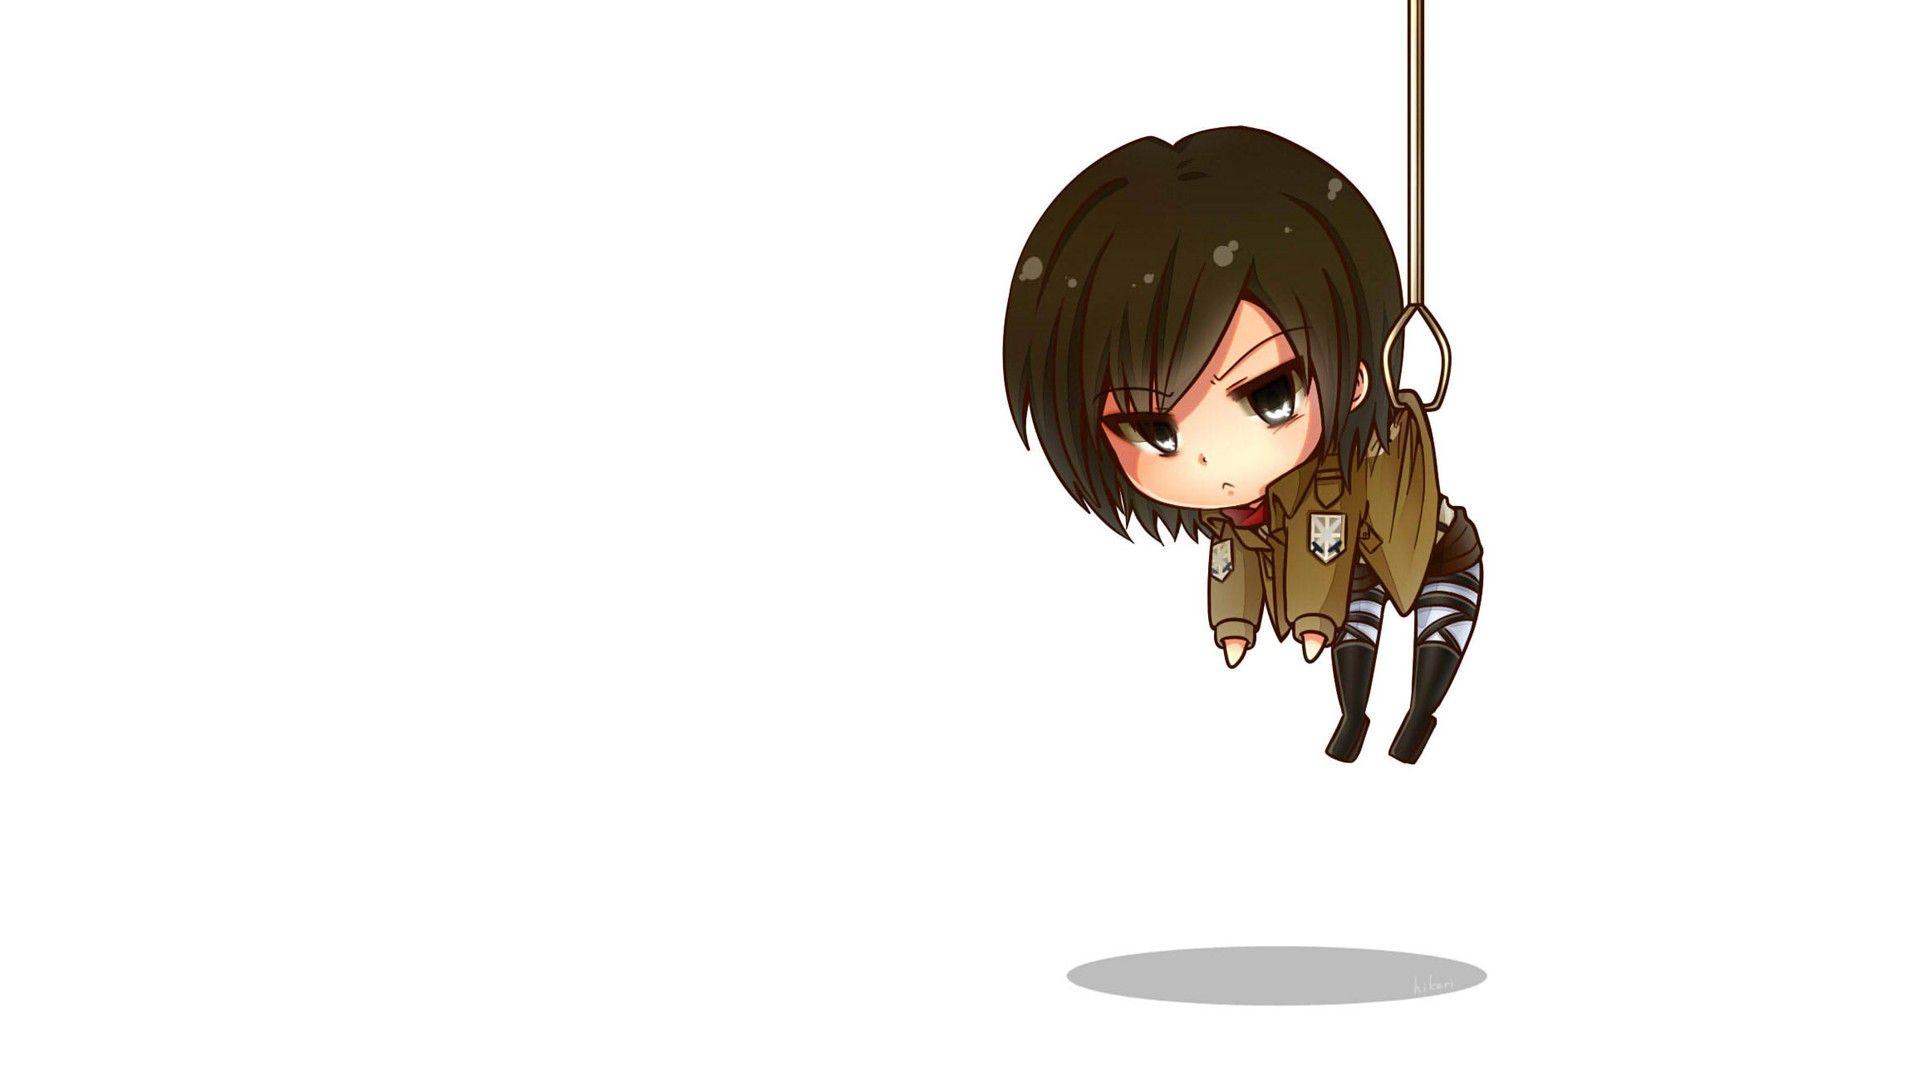 Attack On Titan Hahaha She S Hanging Chibi Wallpaper Cute Anime Wallpaper Anime Wallpaper